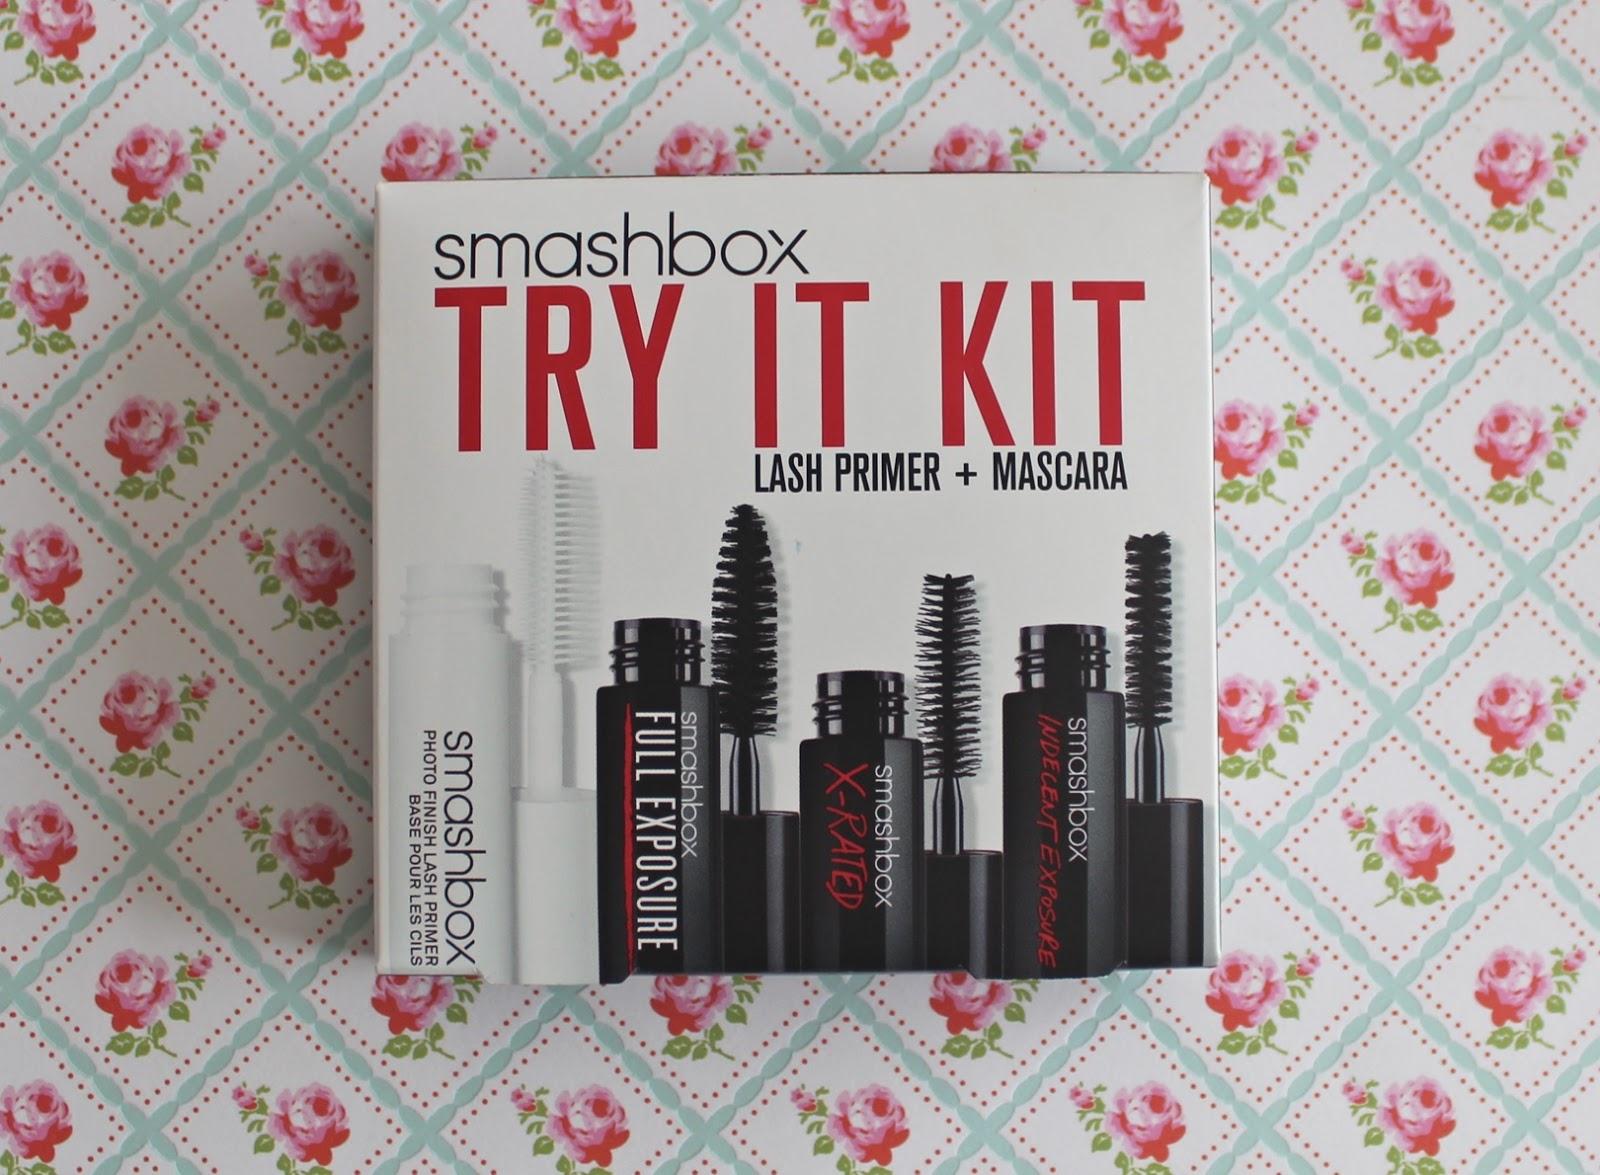 Smashbox Try It Kit - Lash Primer + Mascara